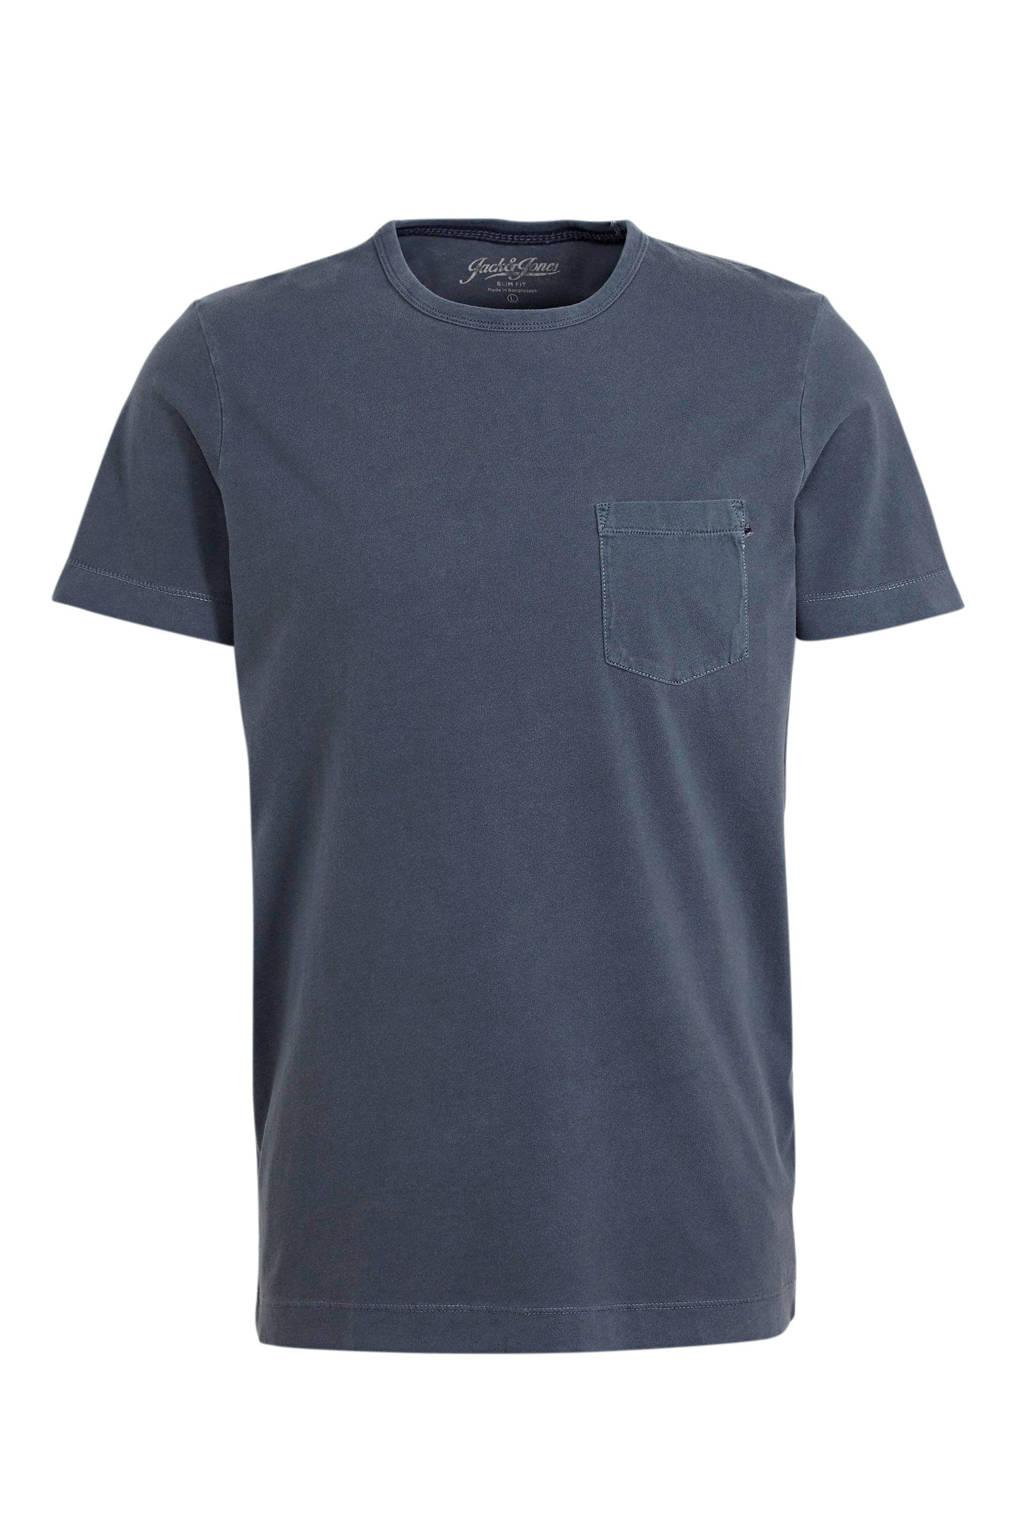 JACK & JONES ESSENTIALS T-shirt blauw, Blauw